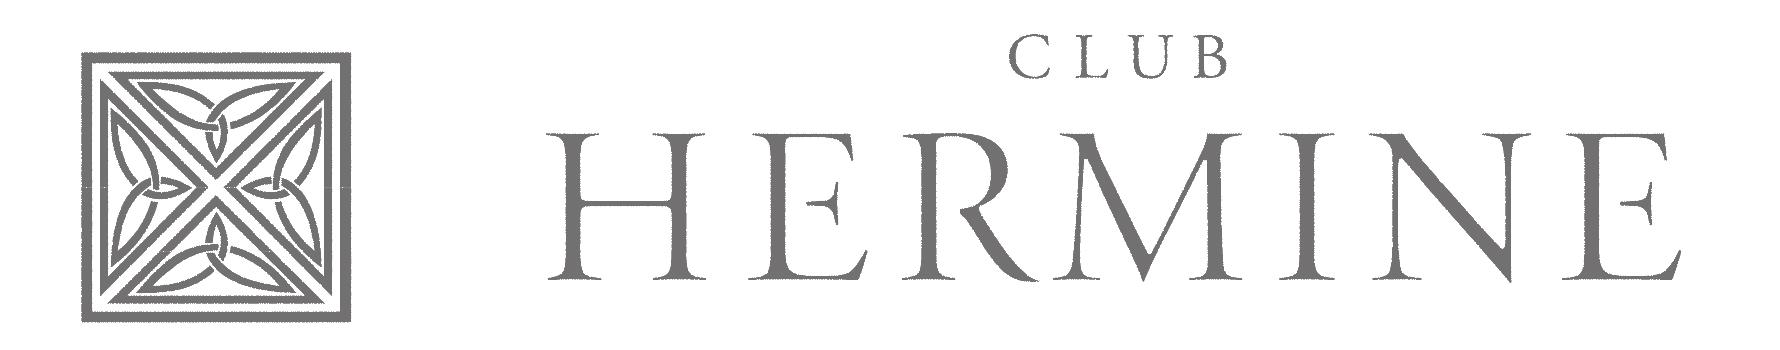 CLUB HERMINE 川崎(川崎)のロゴ